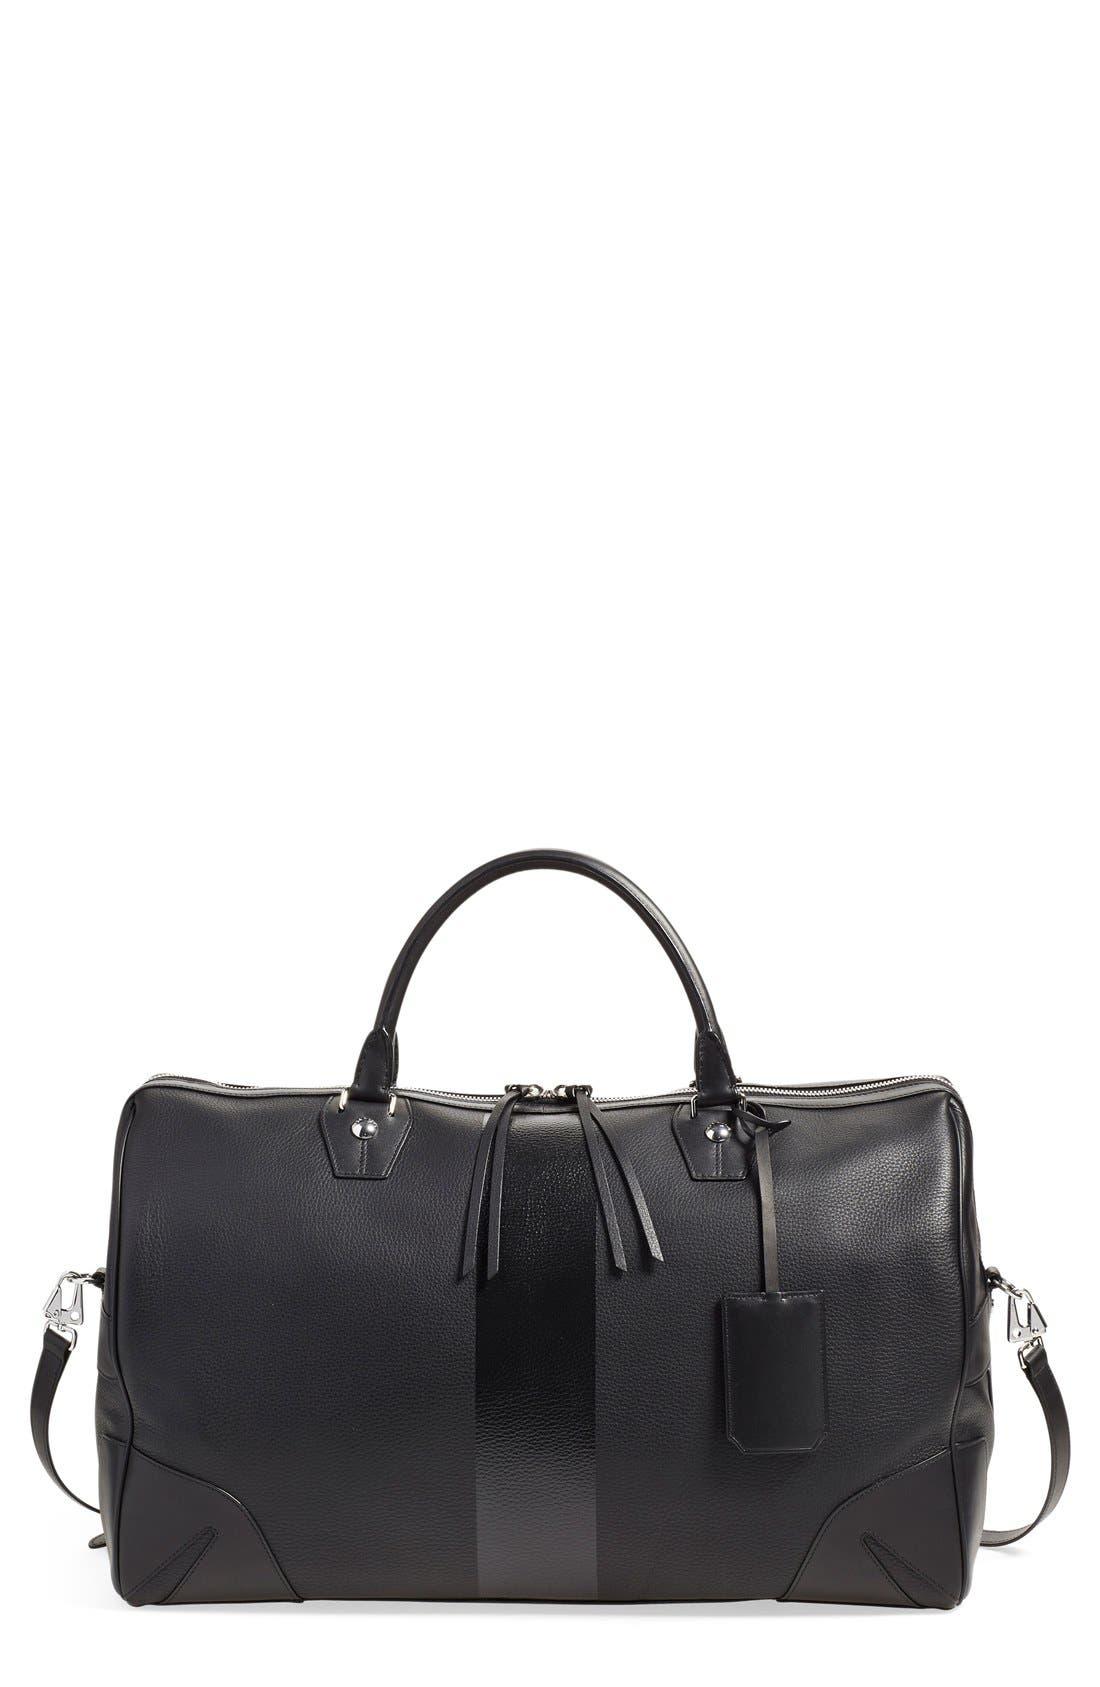 RAG & BONE 'Flight' Leather Travel Bag